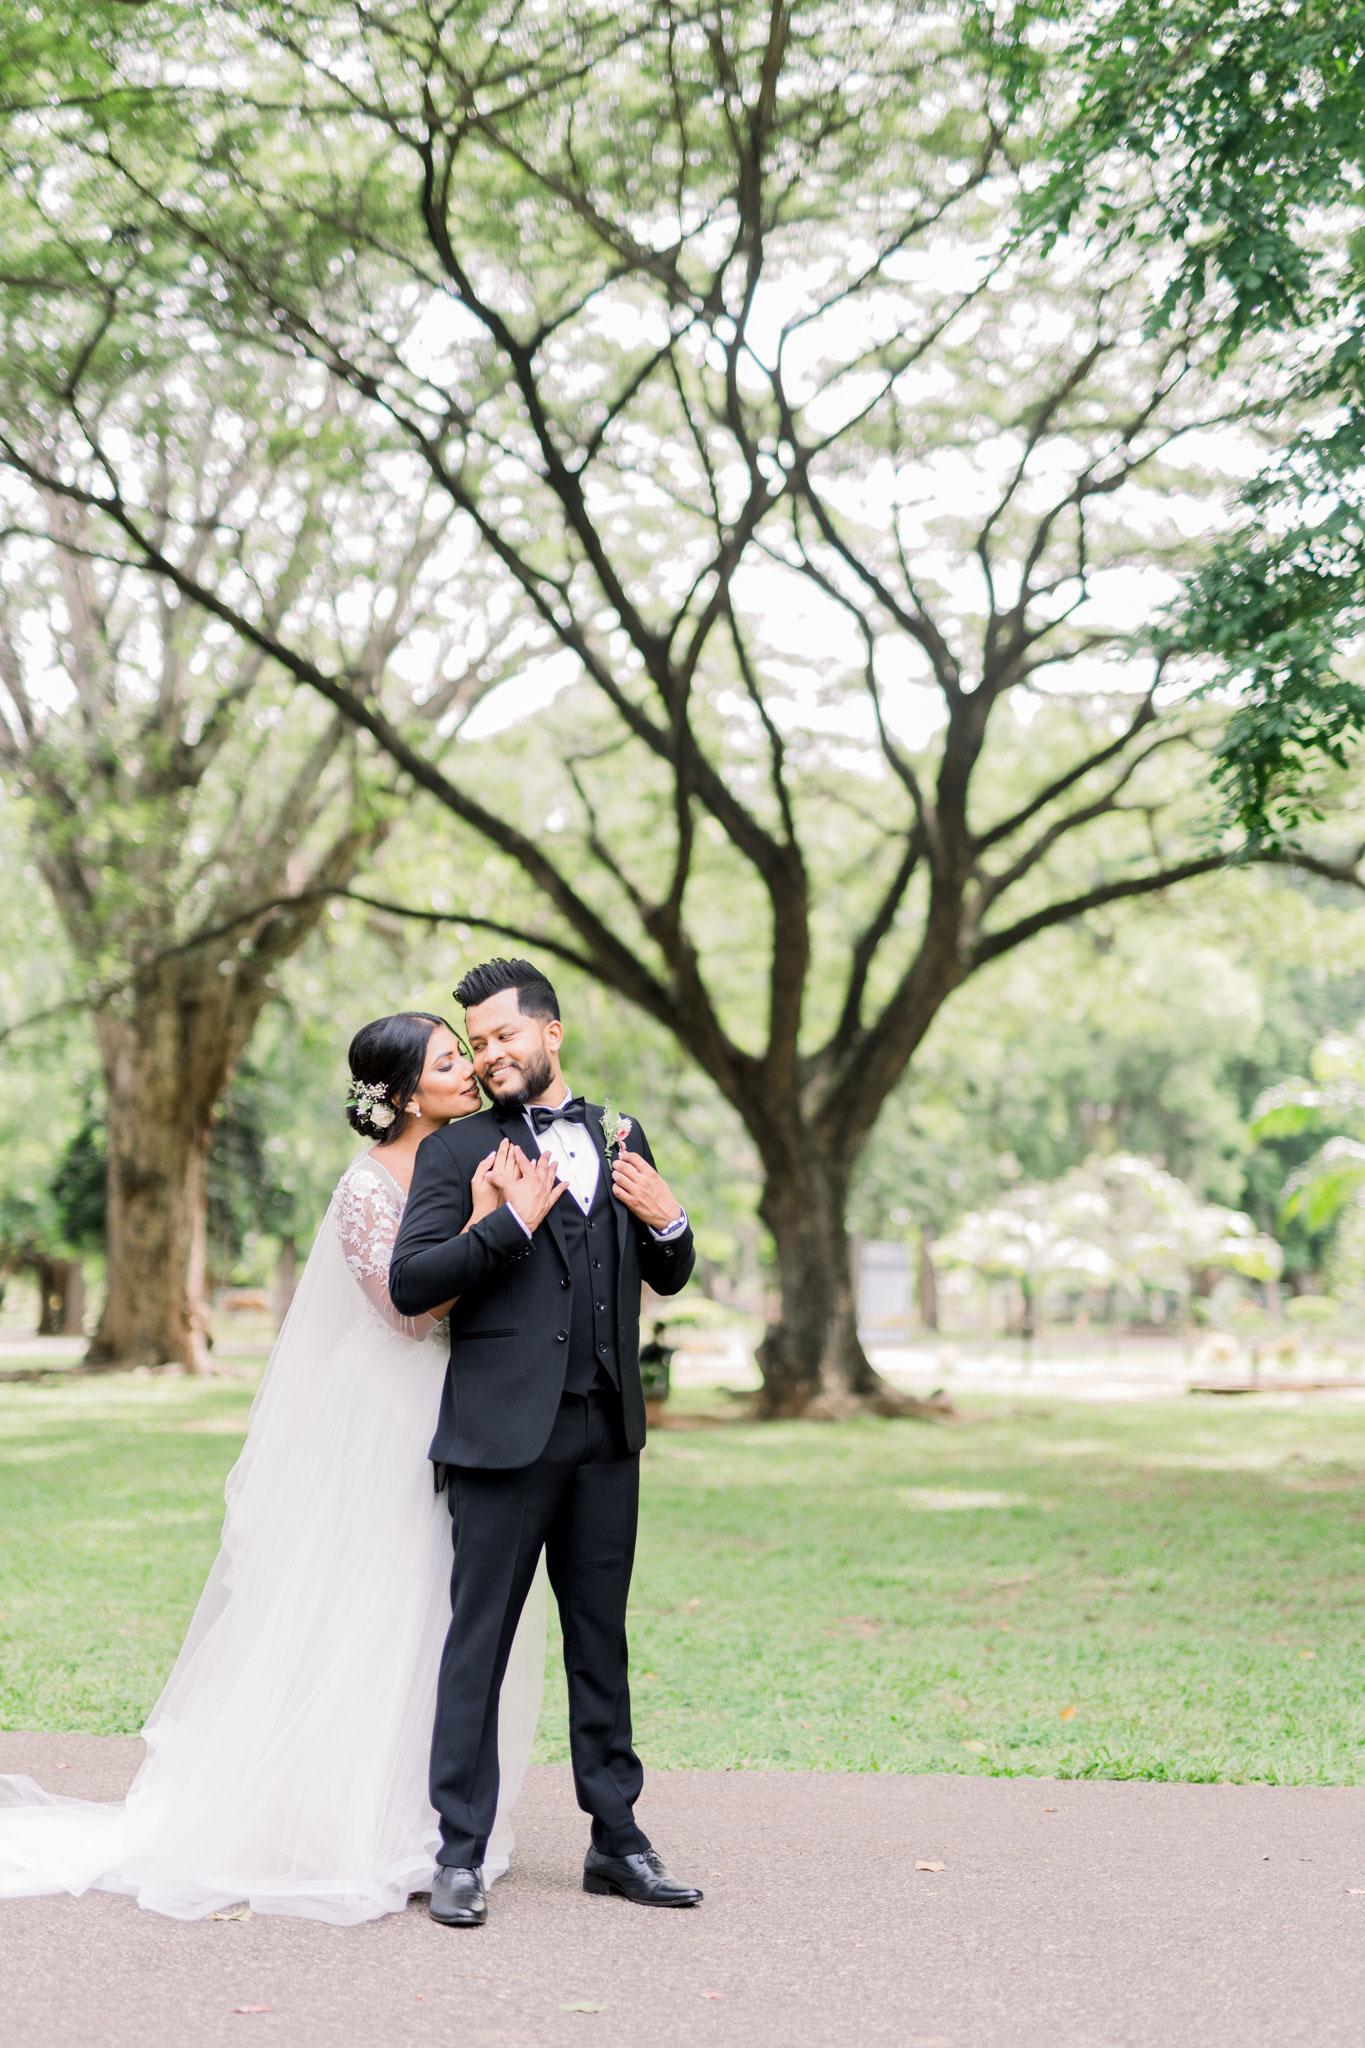 Nayani & Supun - Prabath Kanishka Wedding Photography